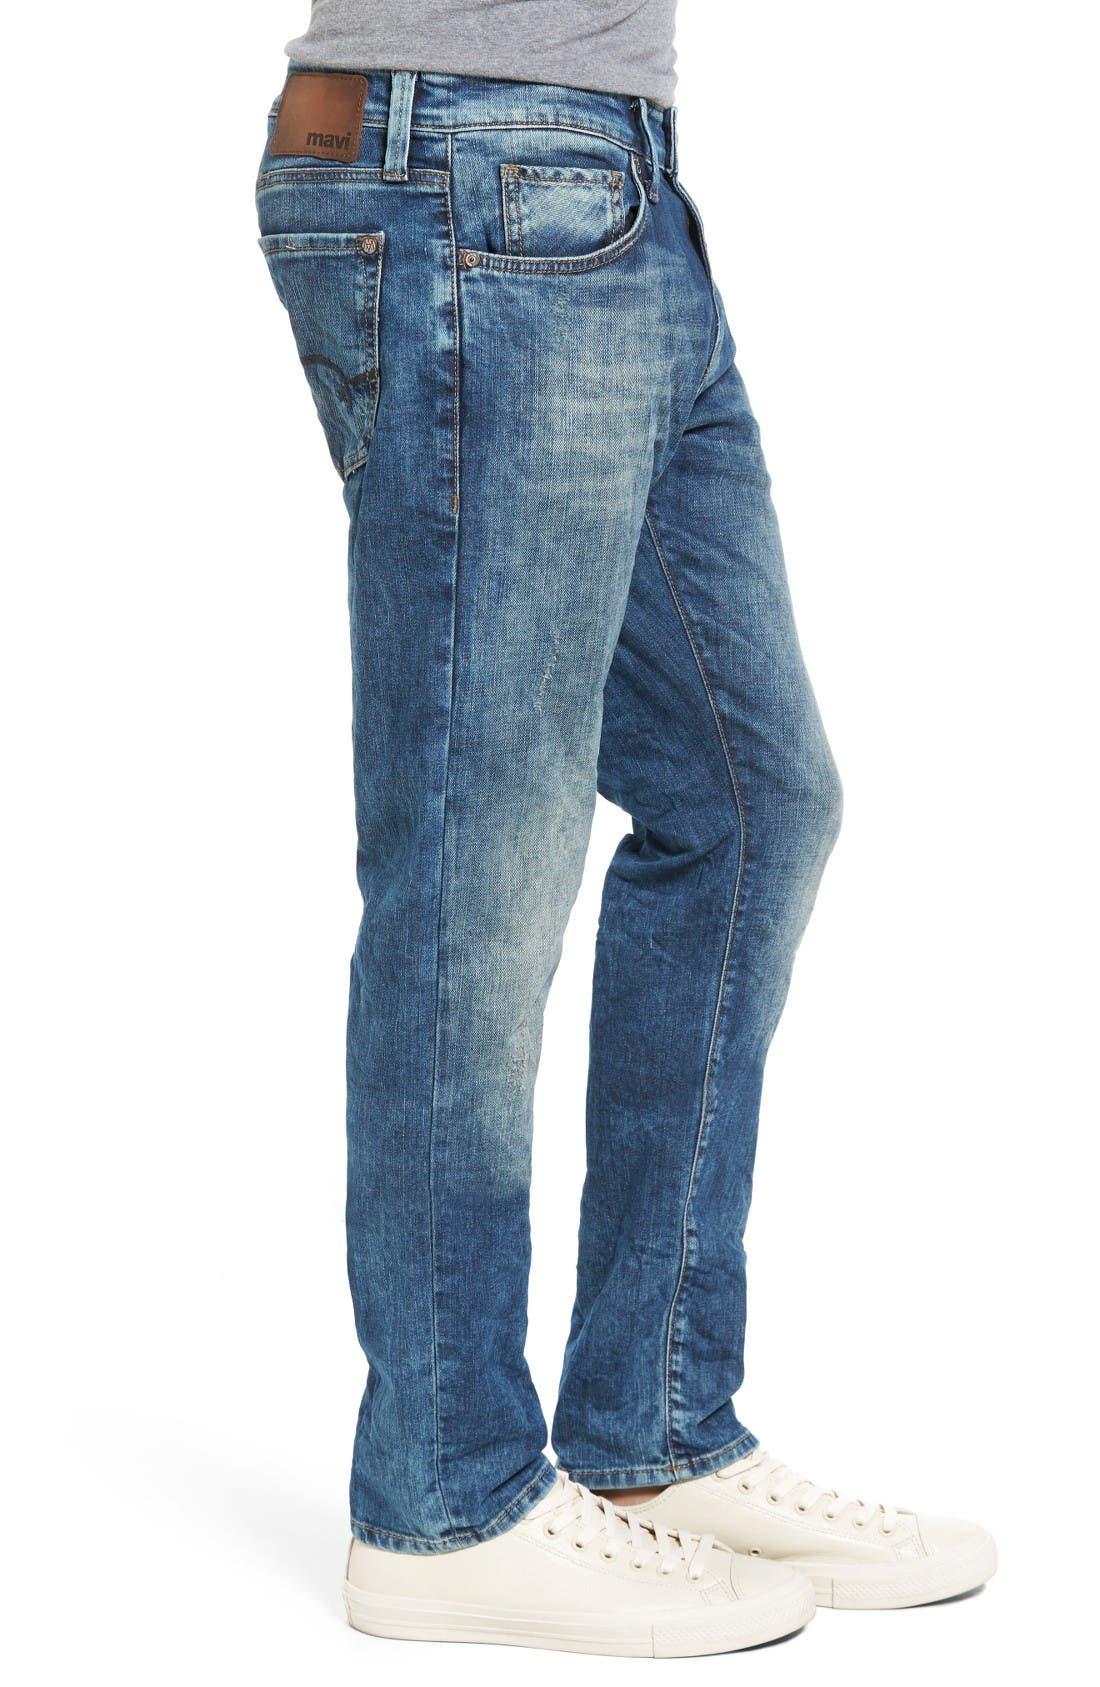 Jake Easy Slim Fit Jeans,                             Alternate thumbnail 3, color,                             Random Extreme Vintage